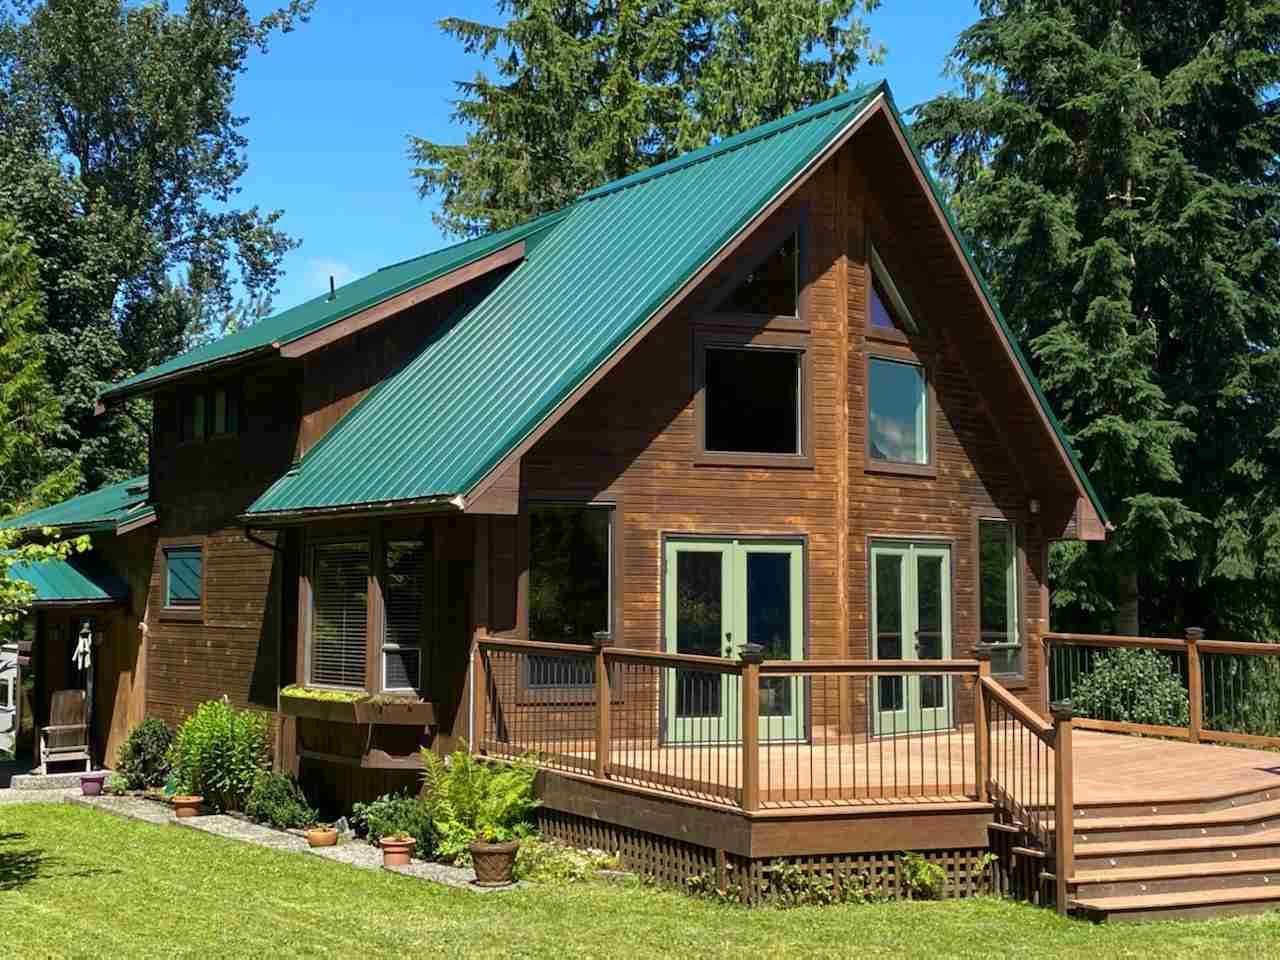 Main Photo: 5140 EXTROM Road: Ryder Lake House for sale (Sardis)  : MLS®# R2473656